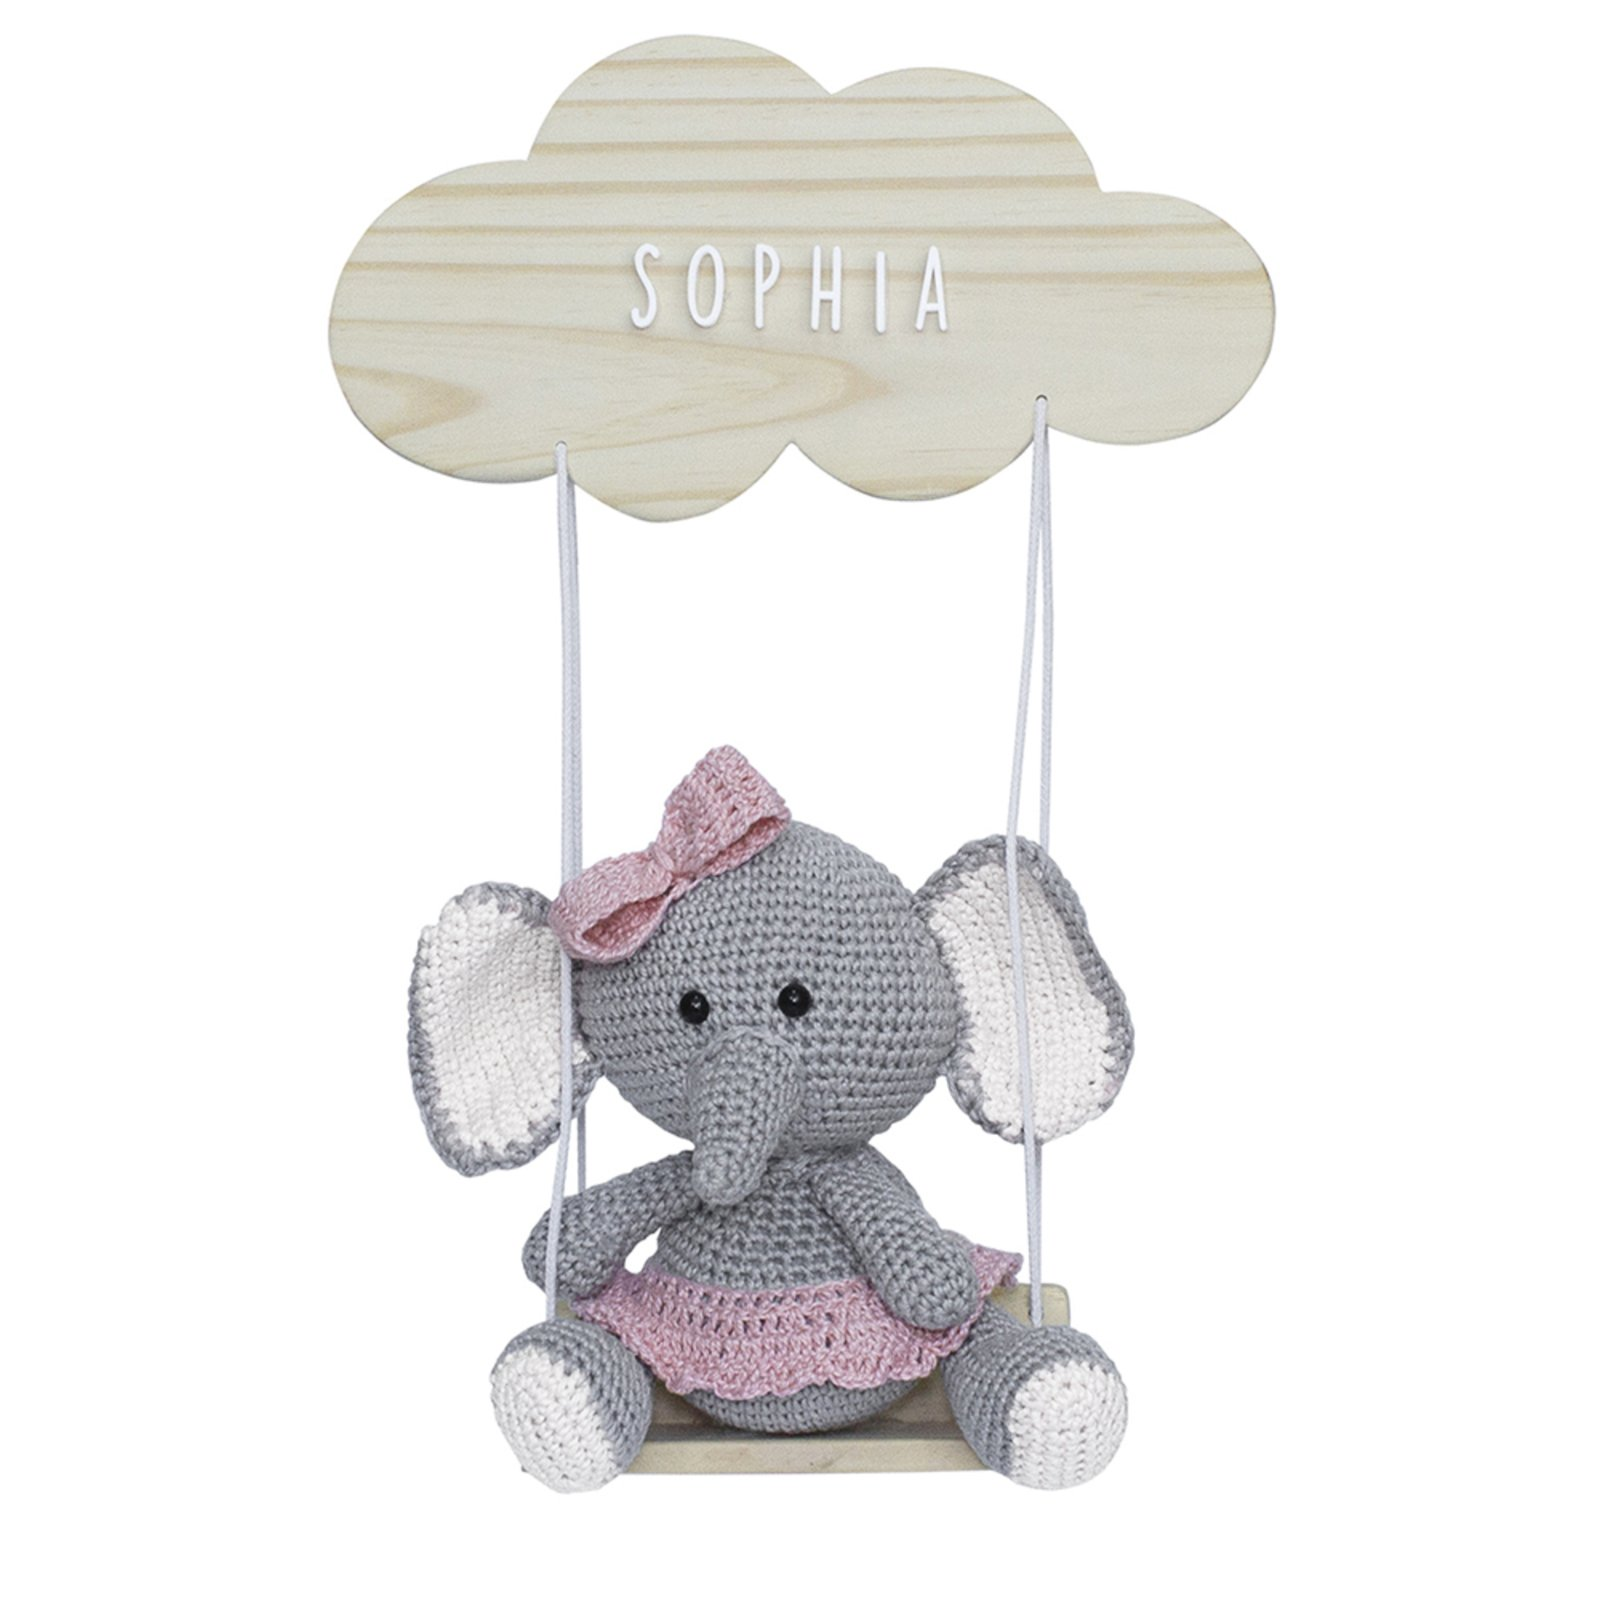 Nuvem De Crochê Rosa - Amigurumi Sob Encomenda - R$ 110,00 em ... | 1600x1600